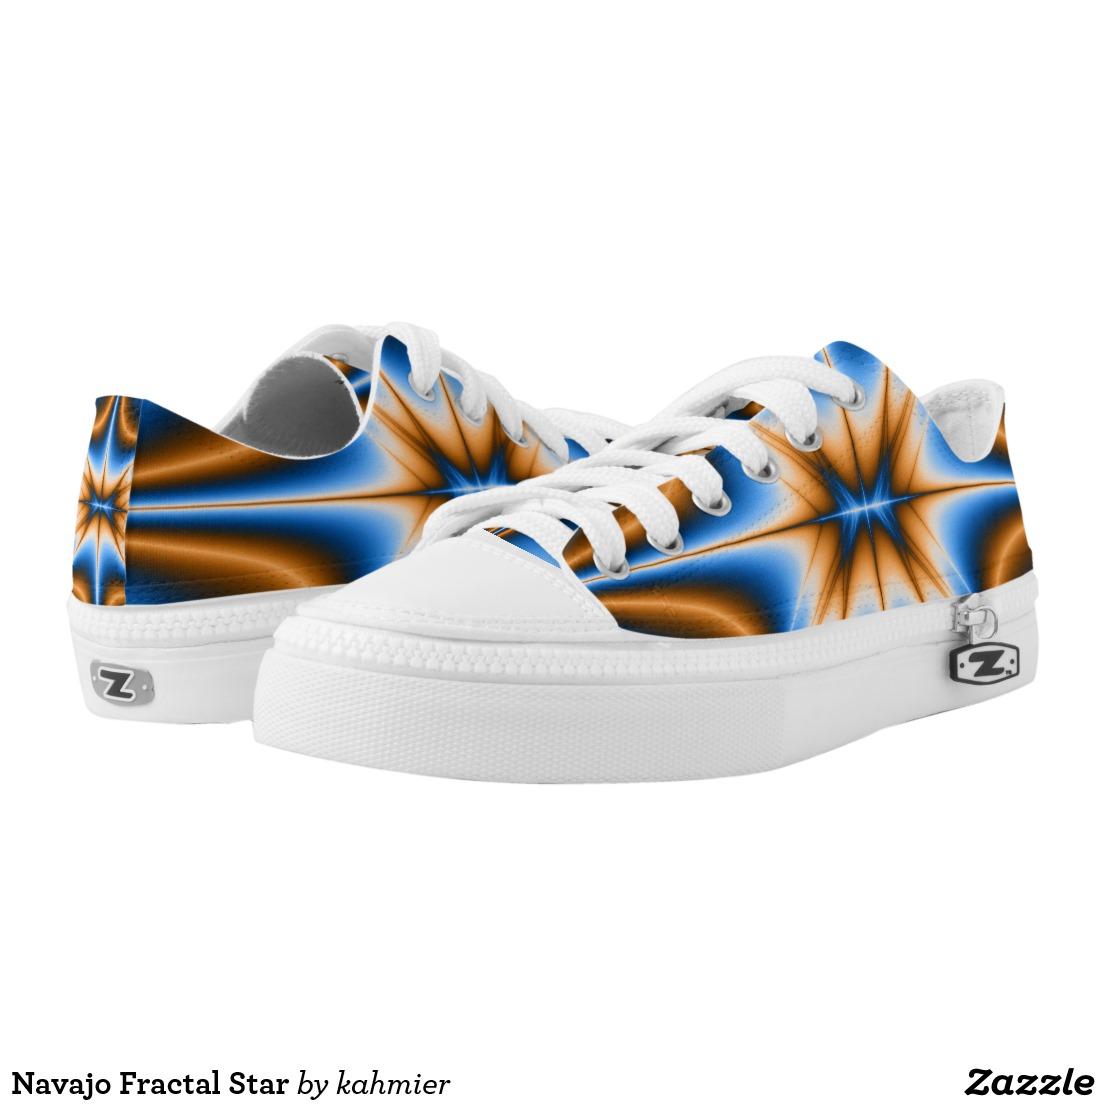 Navajo Fractal Star Low-Top Sneakers